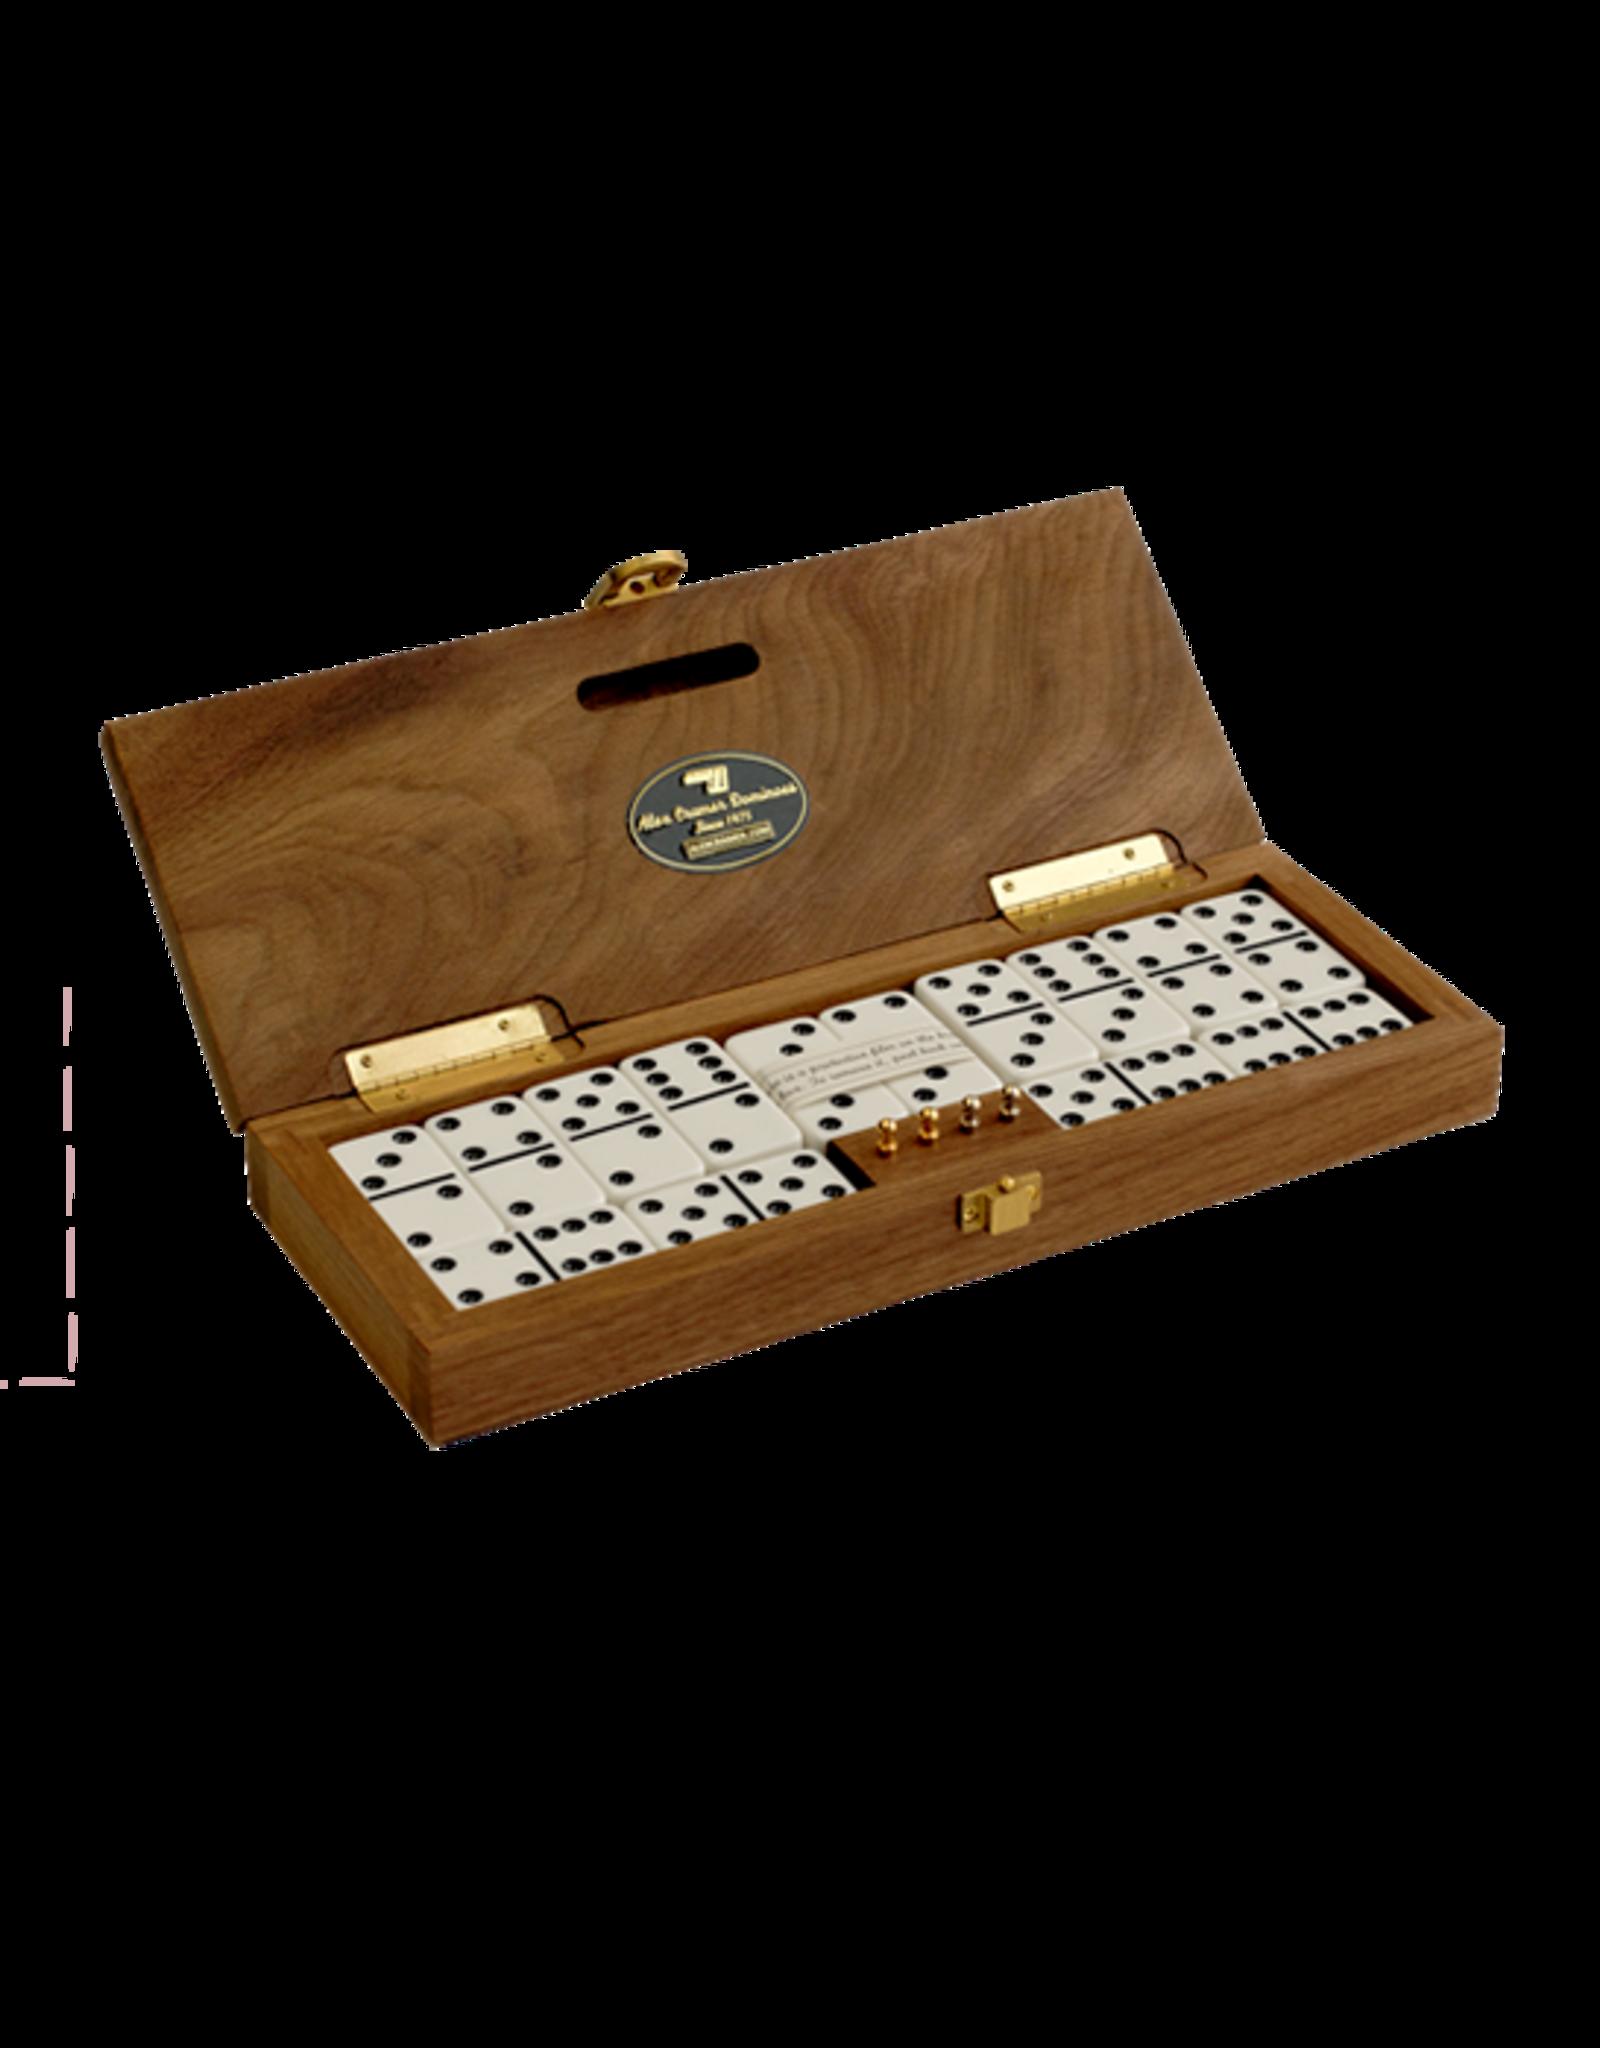 Alex Cramer Co. Mariner Domino Set with Walnut Box